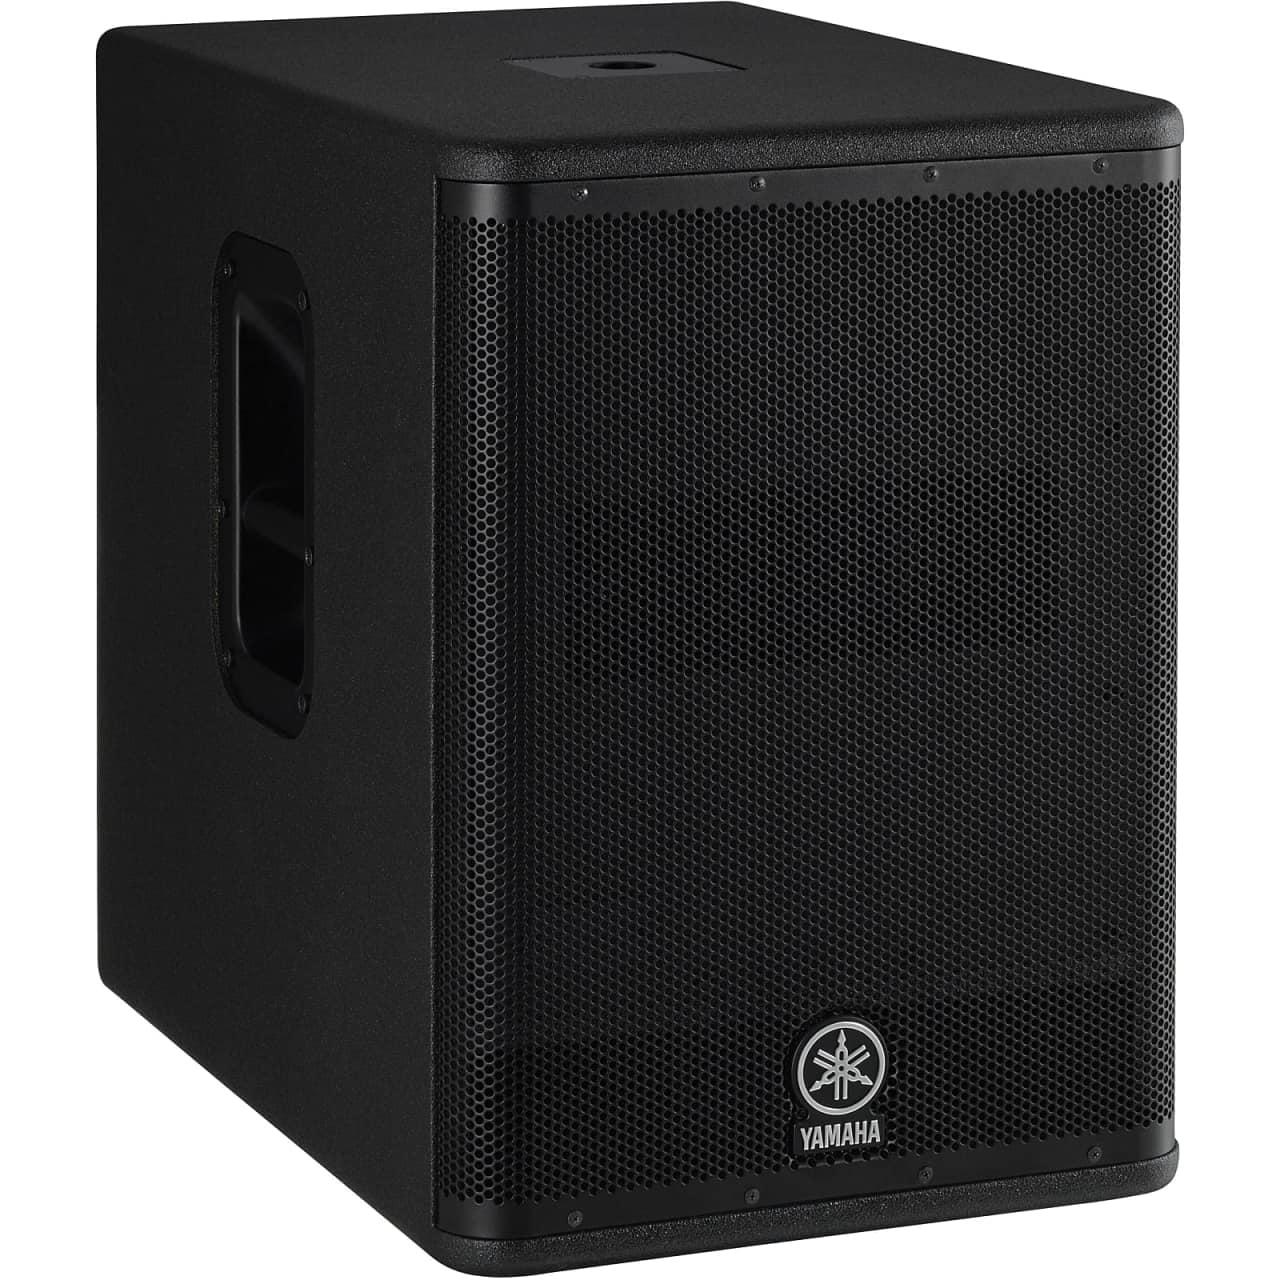 Yamaha dxs12 powered subwoofer 12 speaker 950 watts reverb for Yamaha dxs12 specs